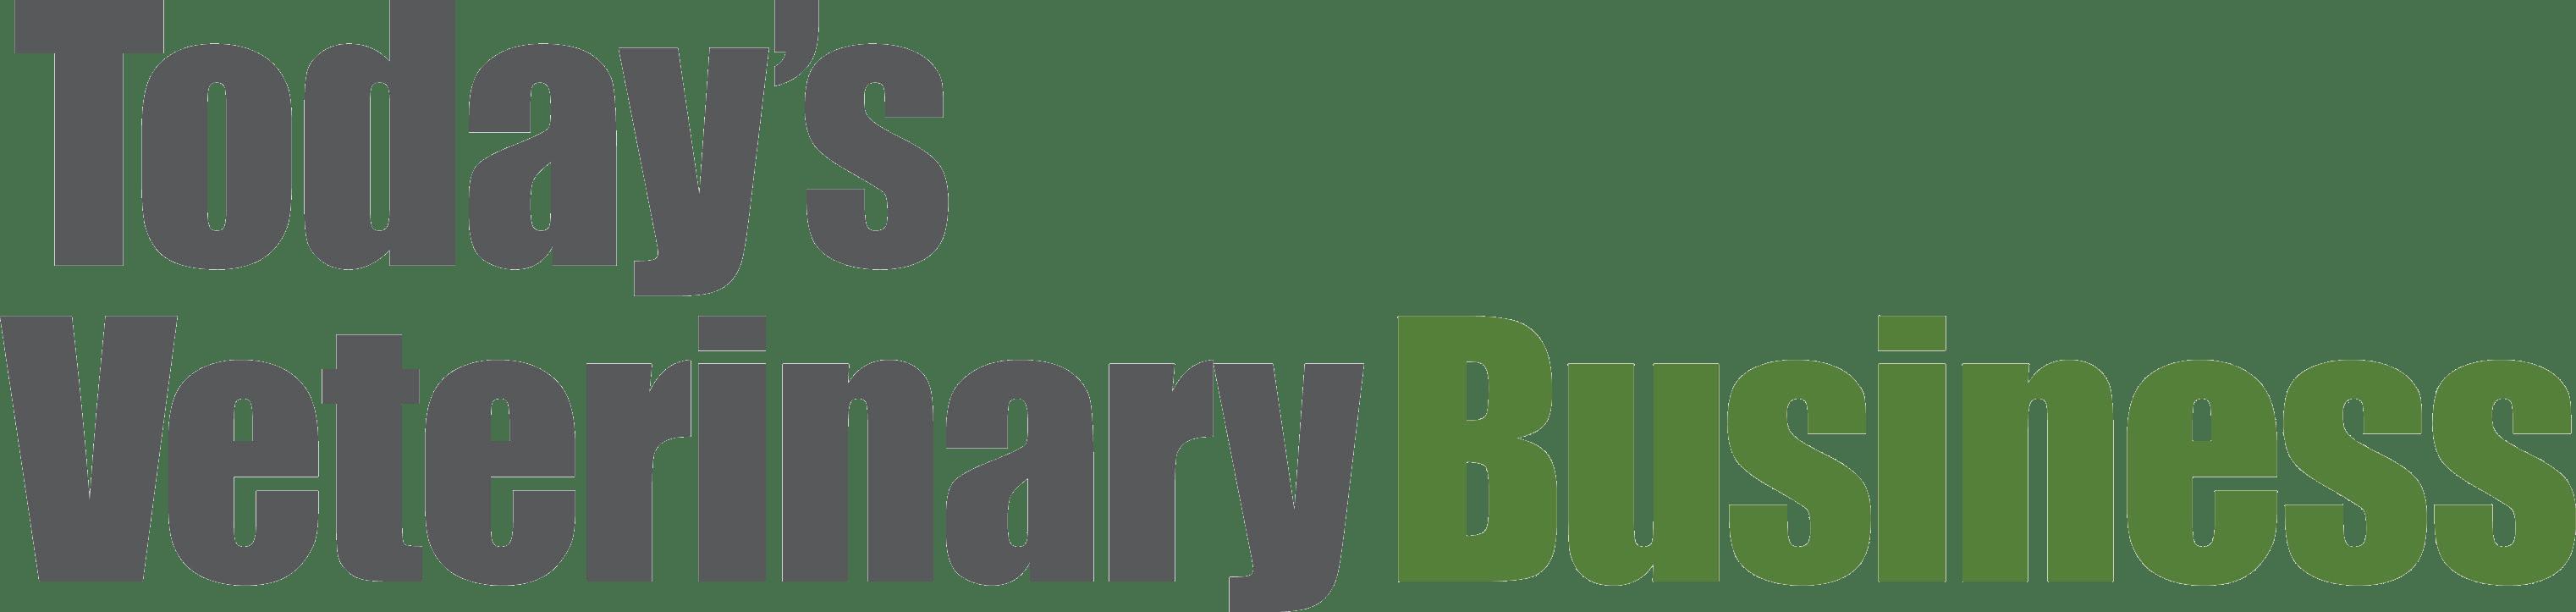 Today's Veterinary Business Logo